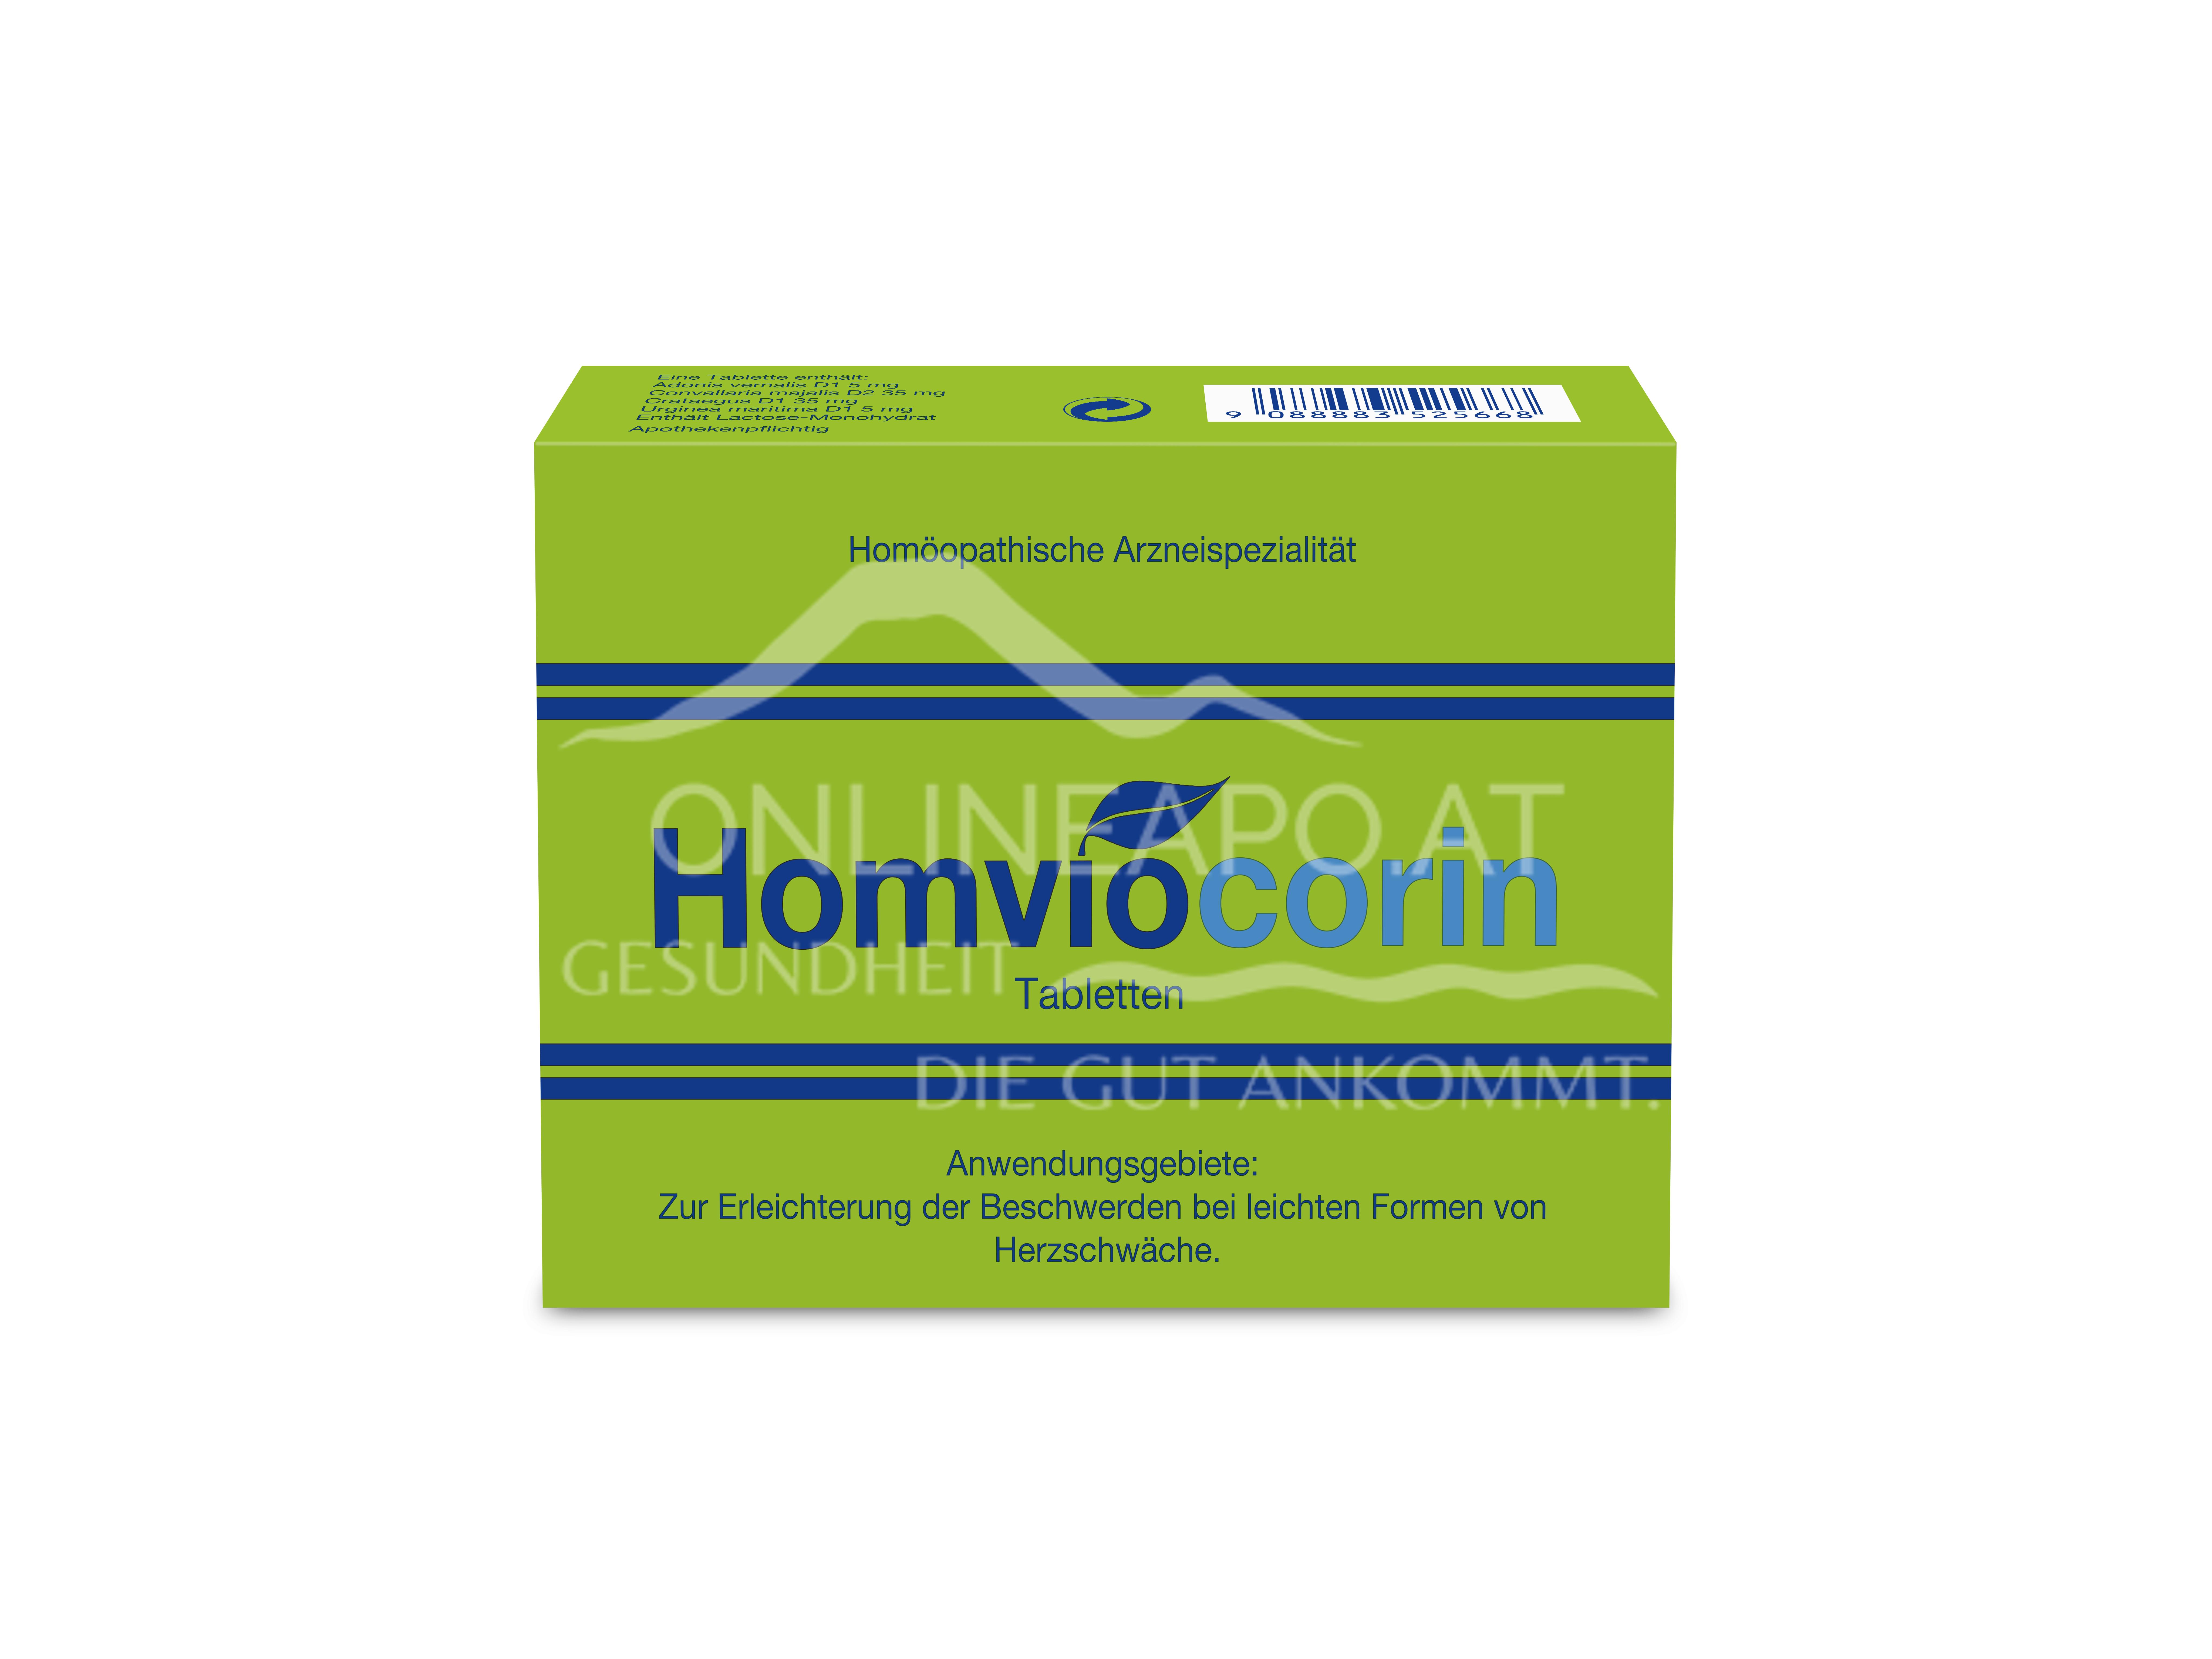 Homviocorin Tabletten